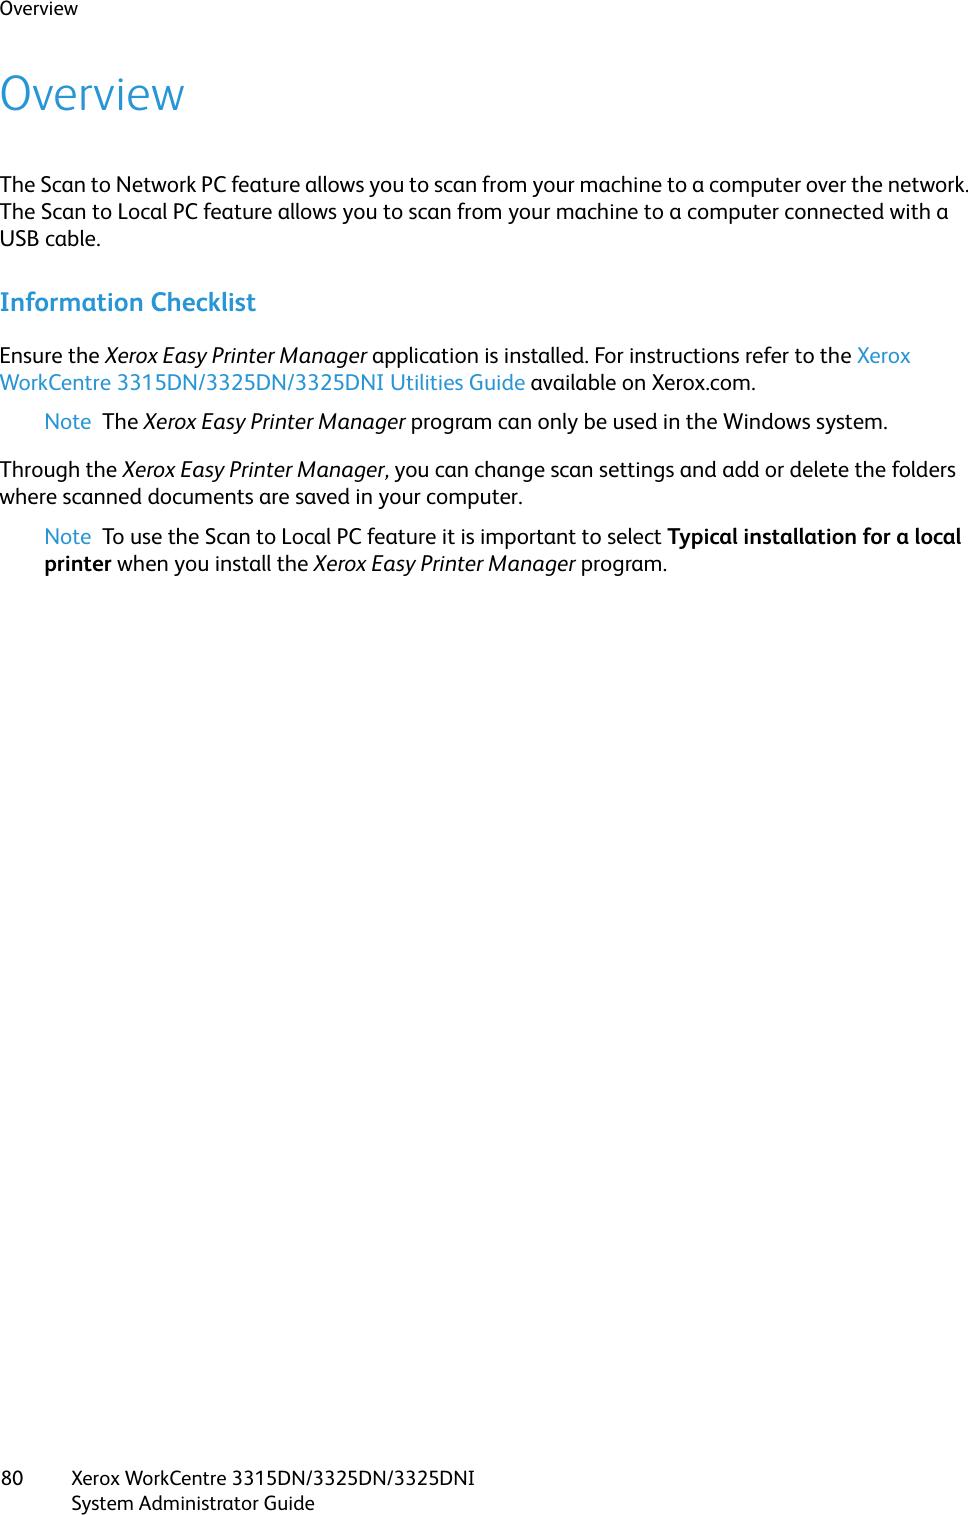 Xerox Network Scan Utility